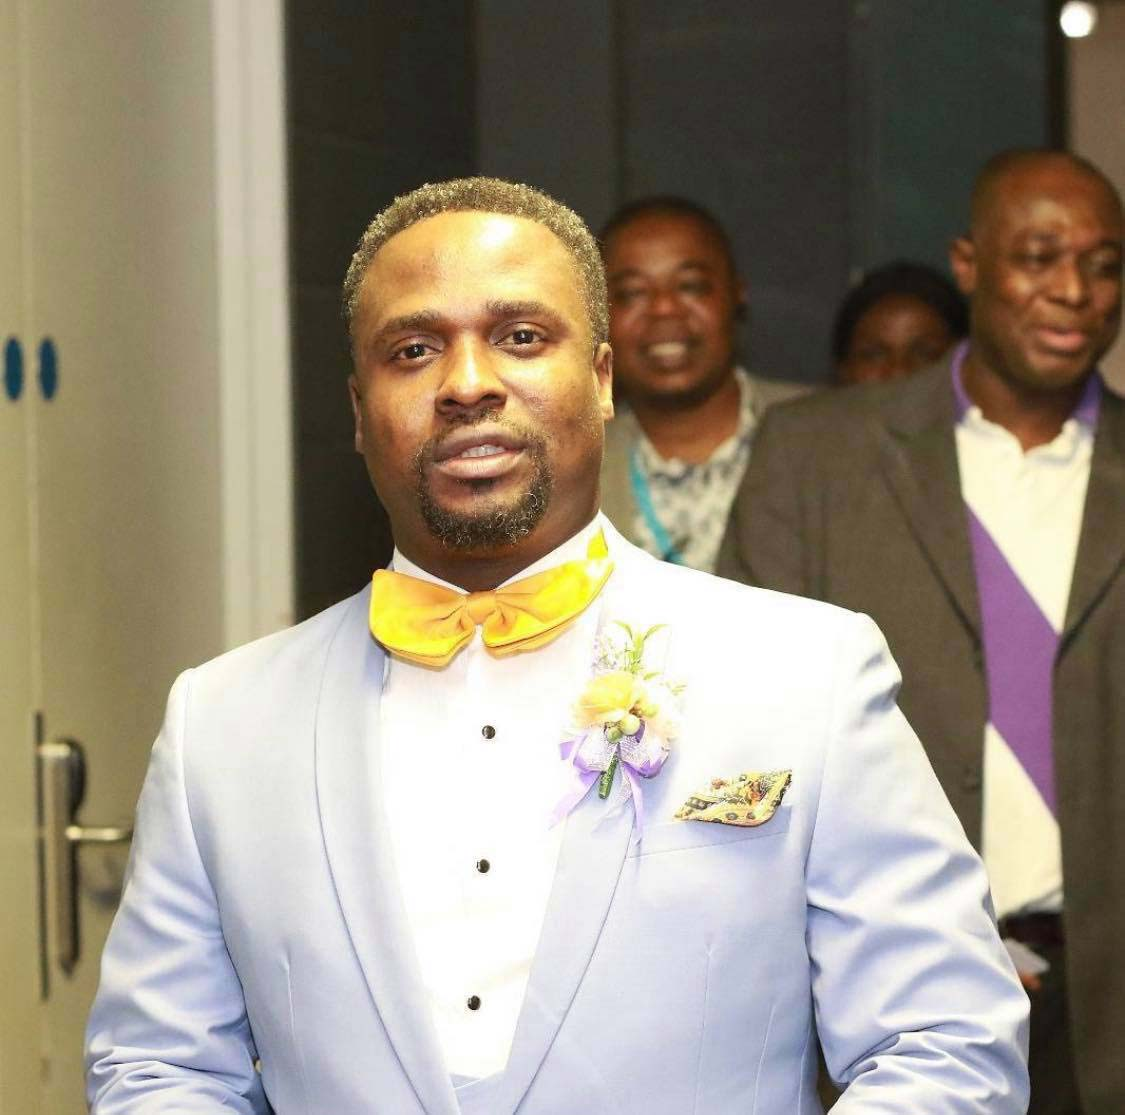 Rev Isaac Osei-Bonsu aka Rev. OB